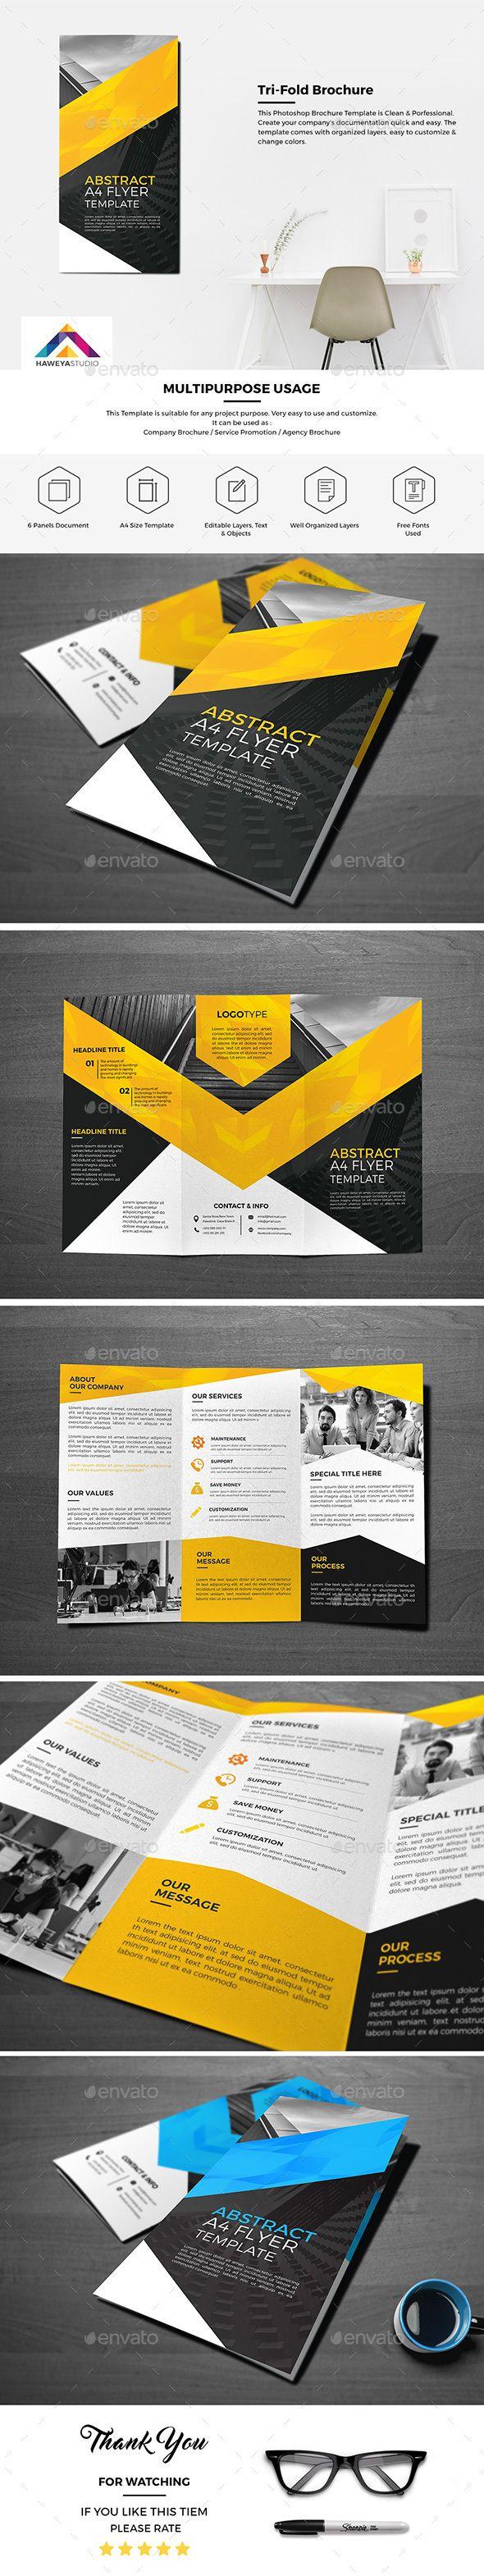 Haweya Tri-Fold Brochure Template PSD. Download here: http://graphicriver.net/item/haweya-trifold-brochure-01-/15774714?ref=ksioks